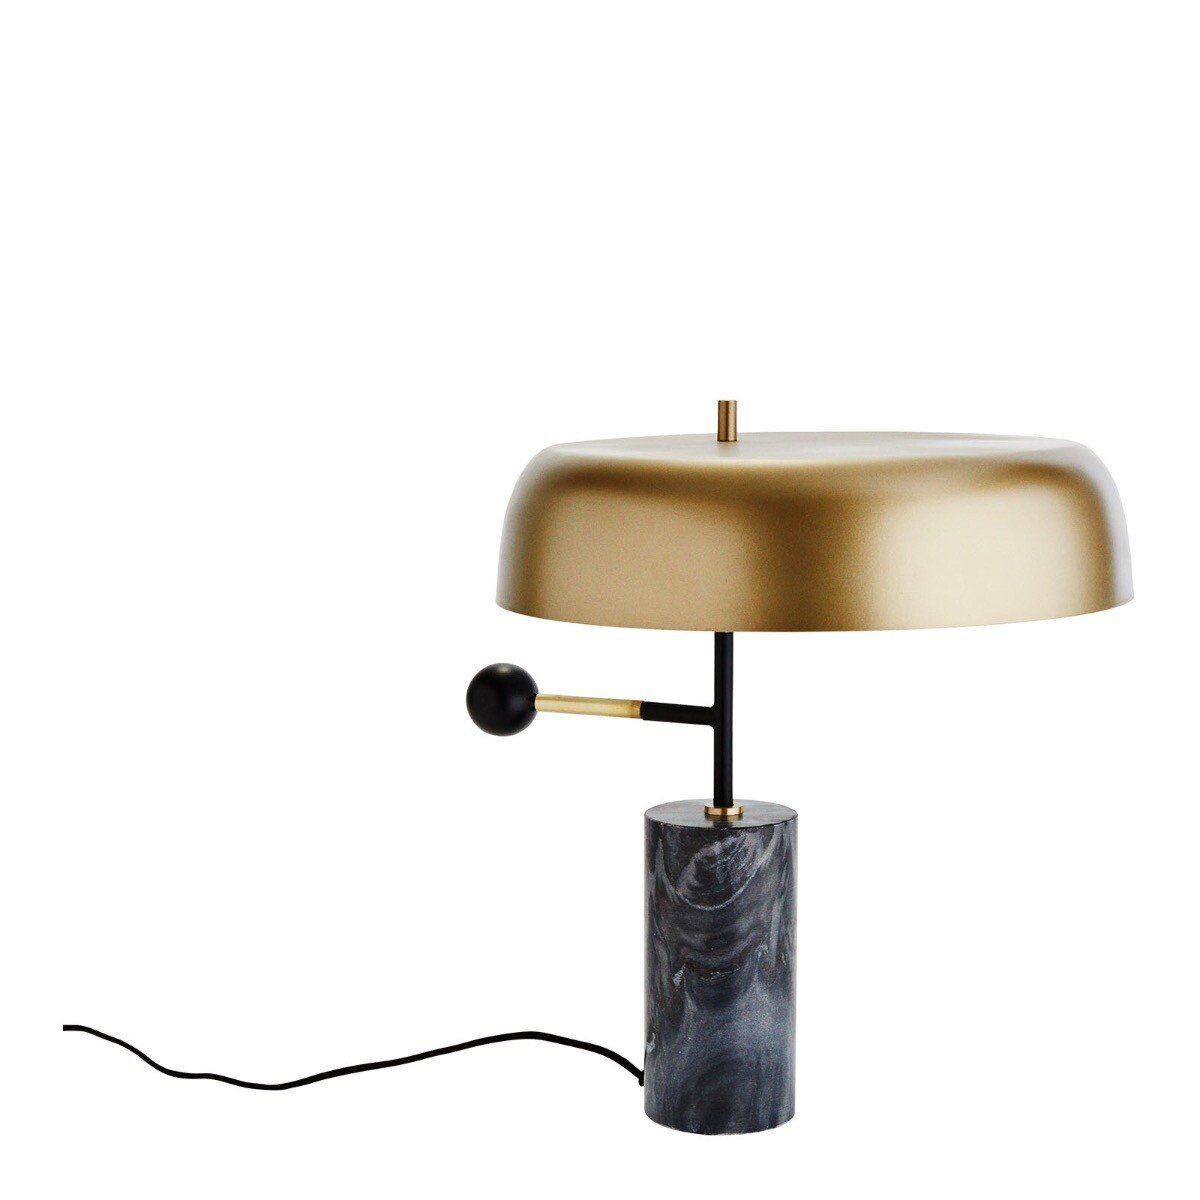 Madam Stoltz tafellamp messing-marmer 43 x Ø 44